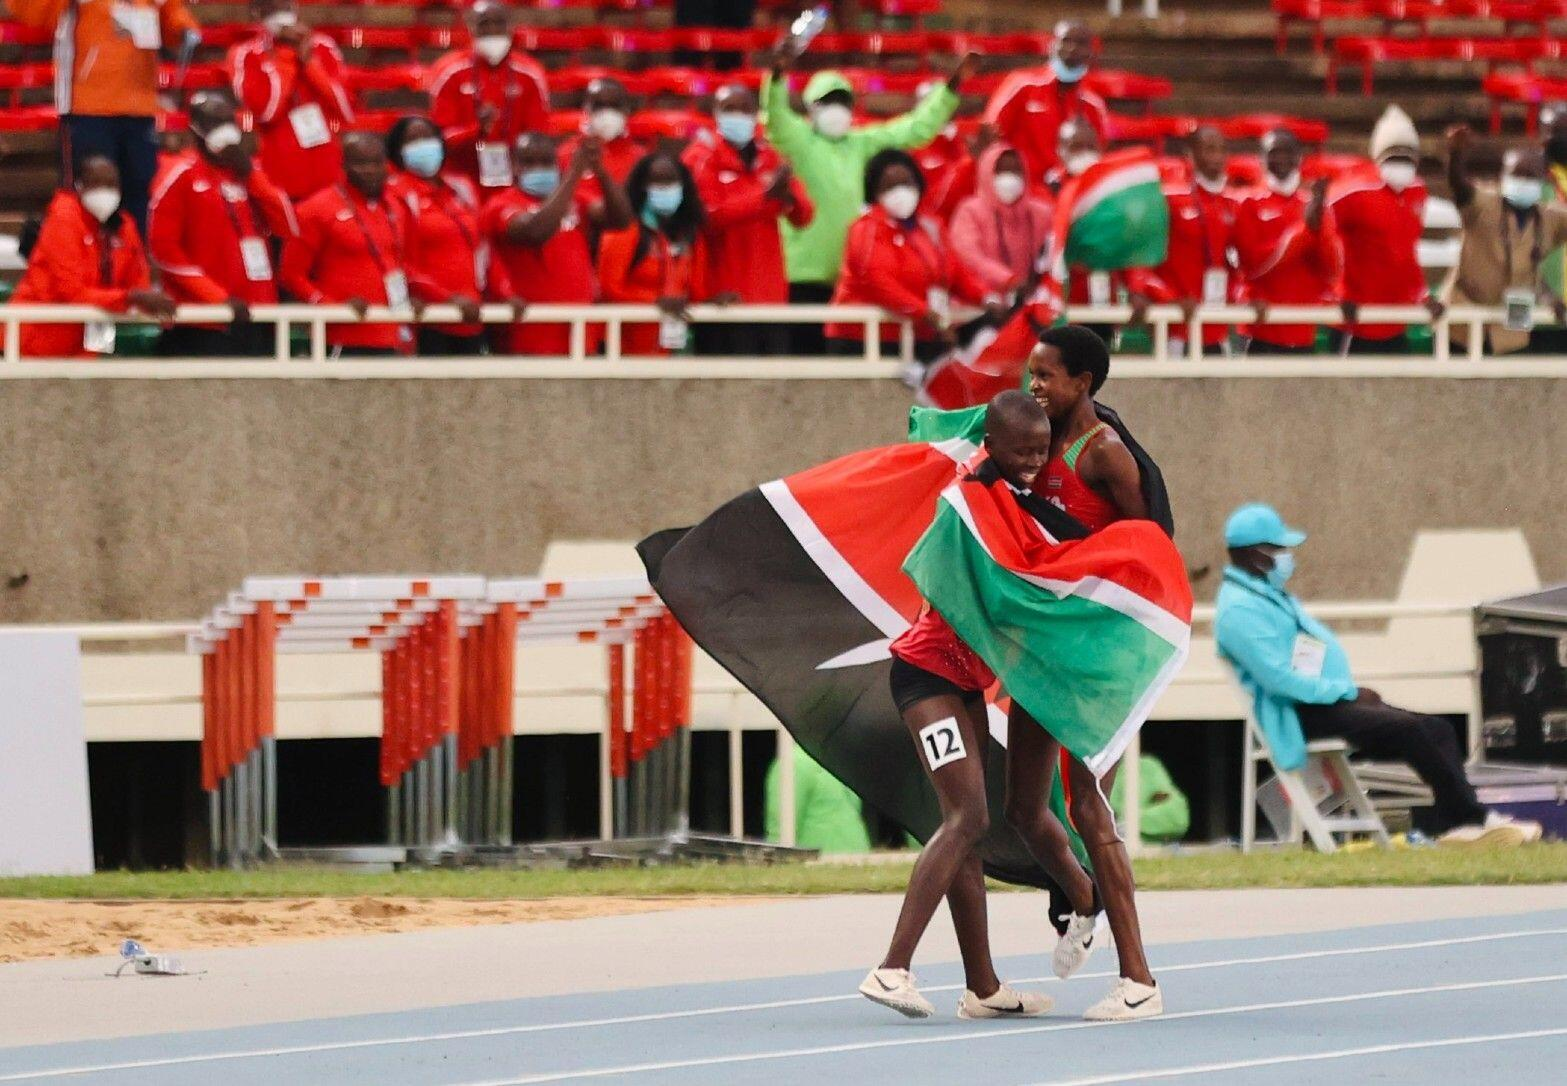 Jackline Chepkoech on her way to 3000m steeplechase victory at the World U20 Championships in Nairobi (© Dan Vernon)